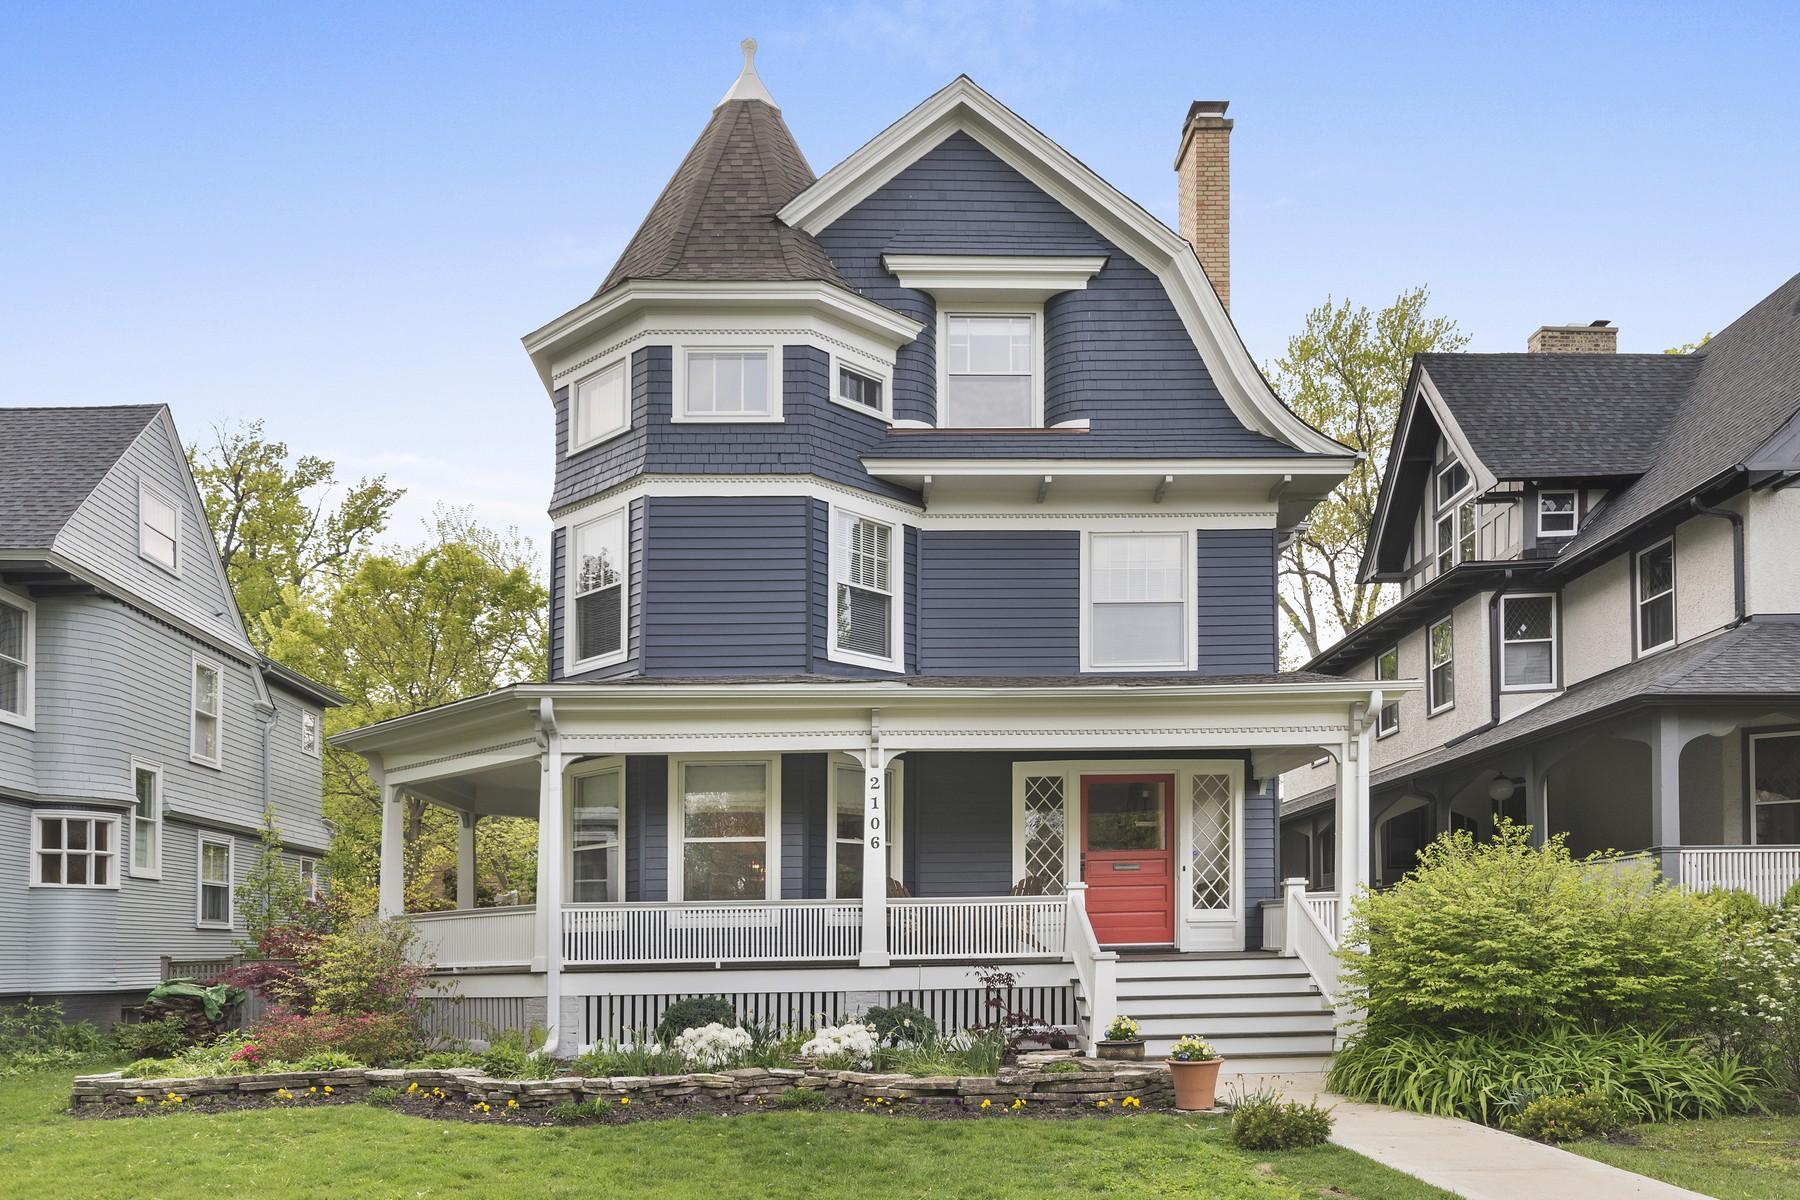 Single Family Home for Sale at Superb Queen Anne Victorian 2106 Orrington Avenue Evanston, Illinois 60201 United States